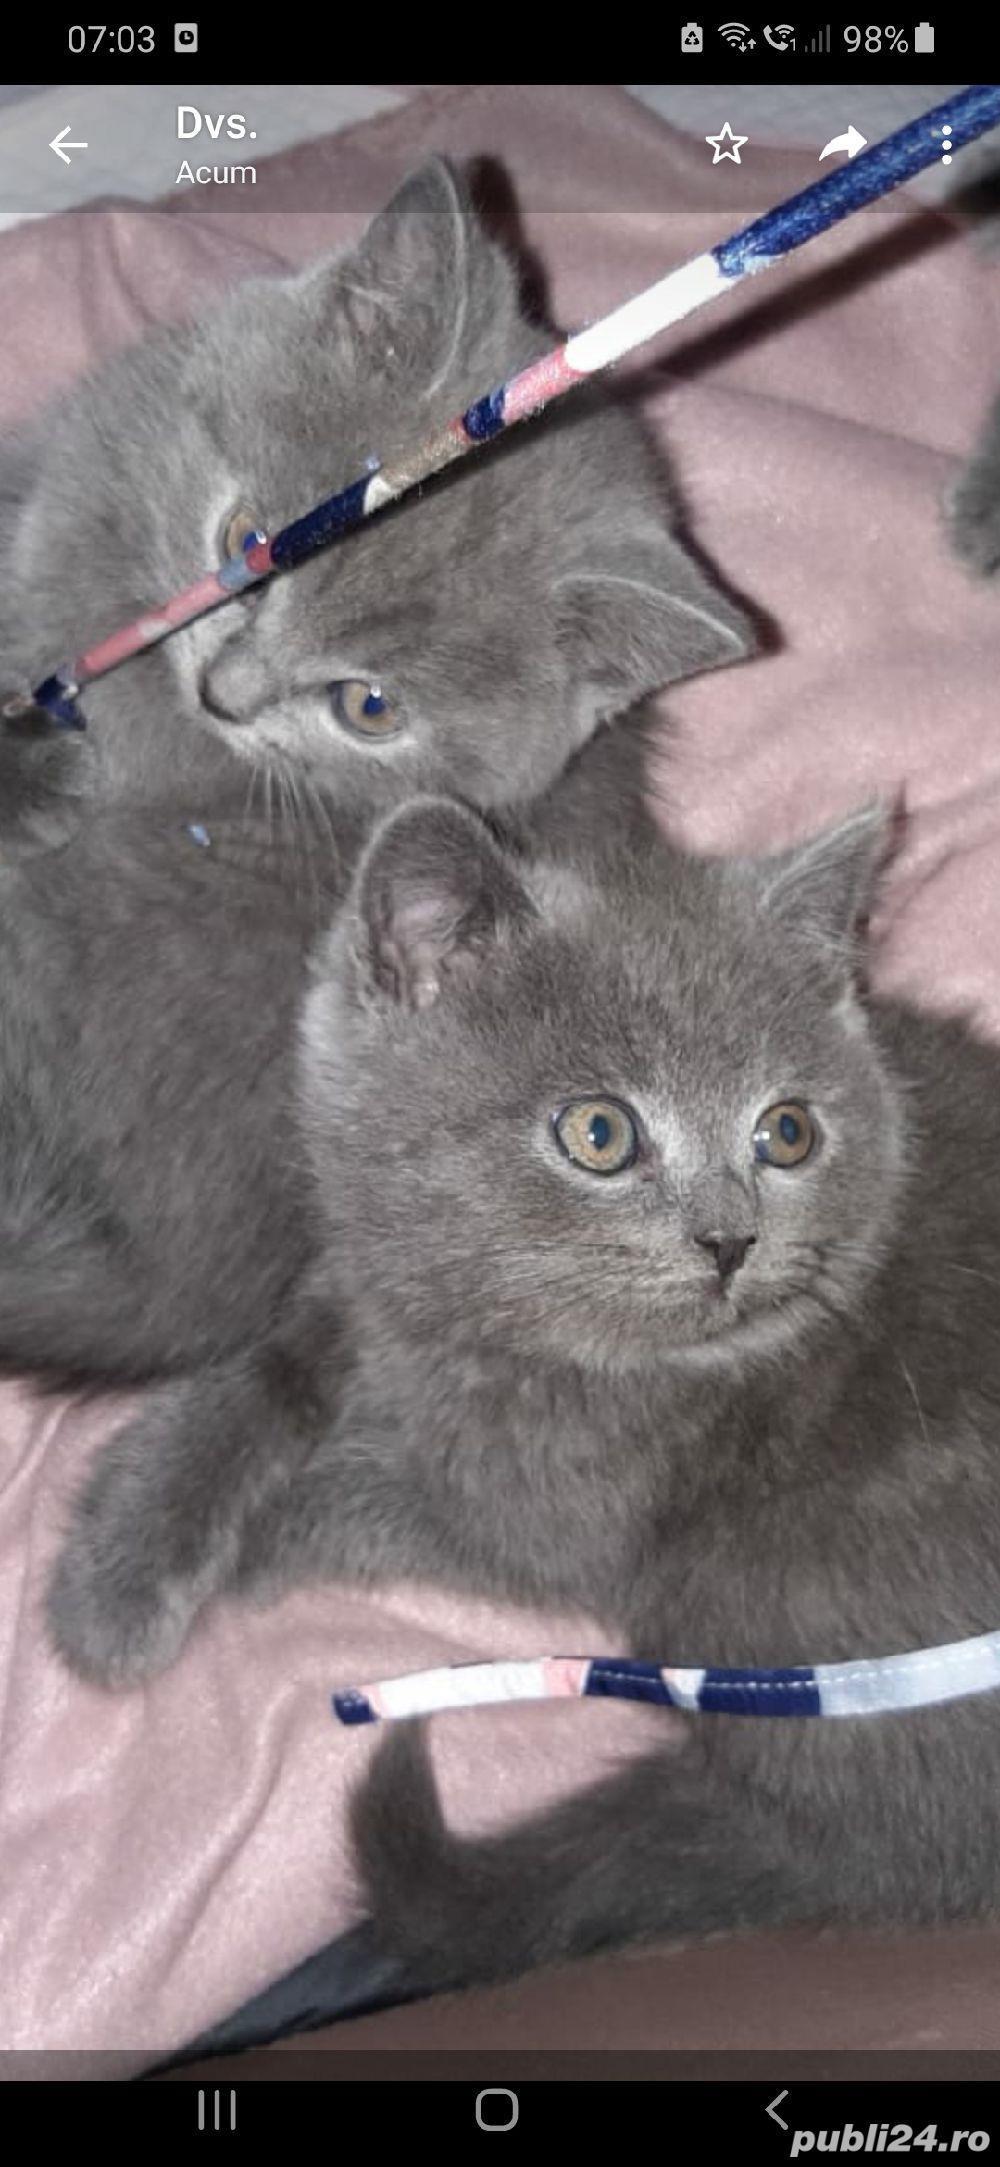 pisici british shorthair blu cu pasaport si cip .au12 saptamani